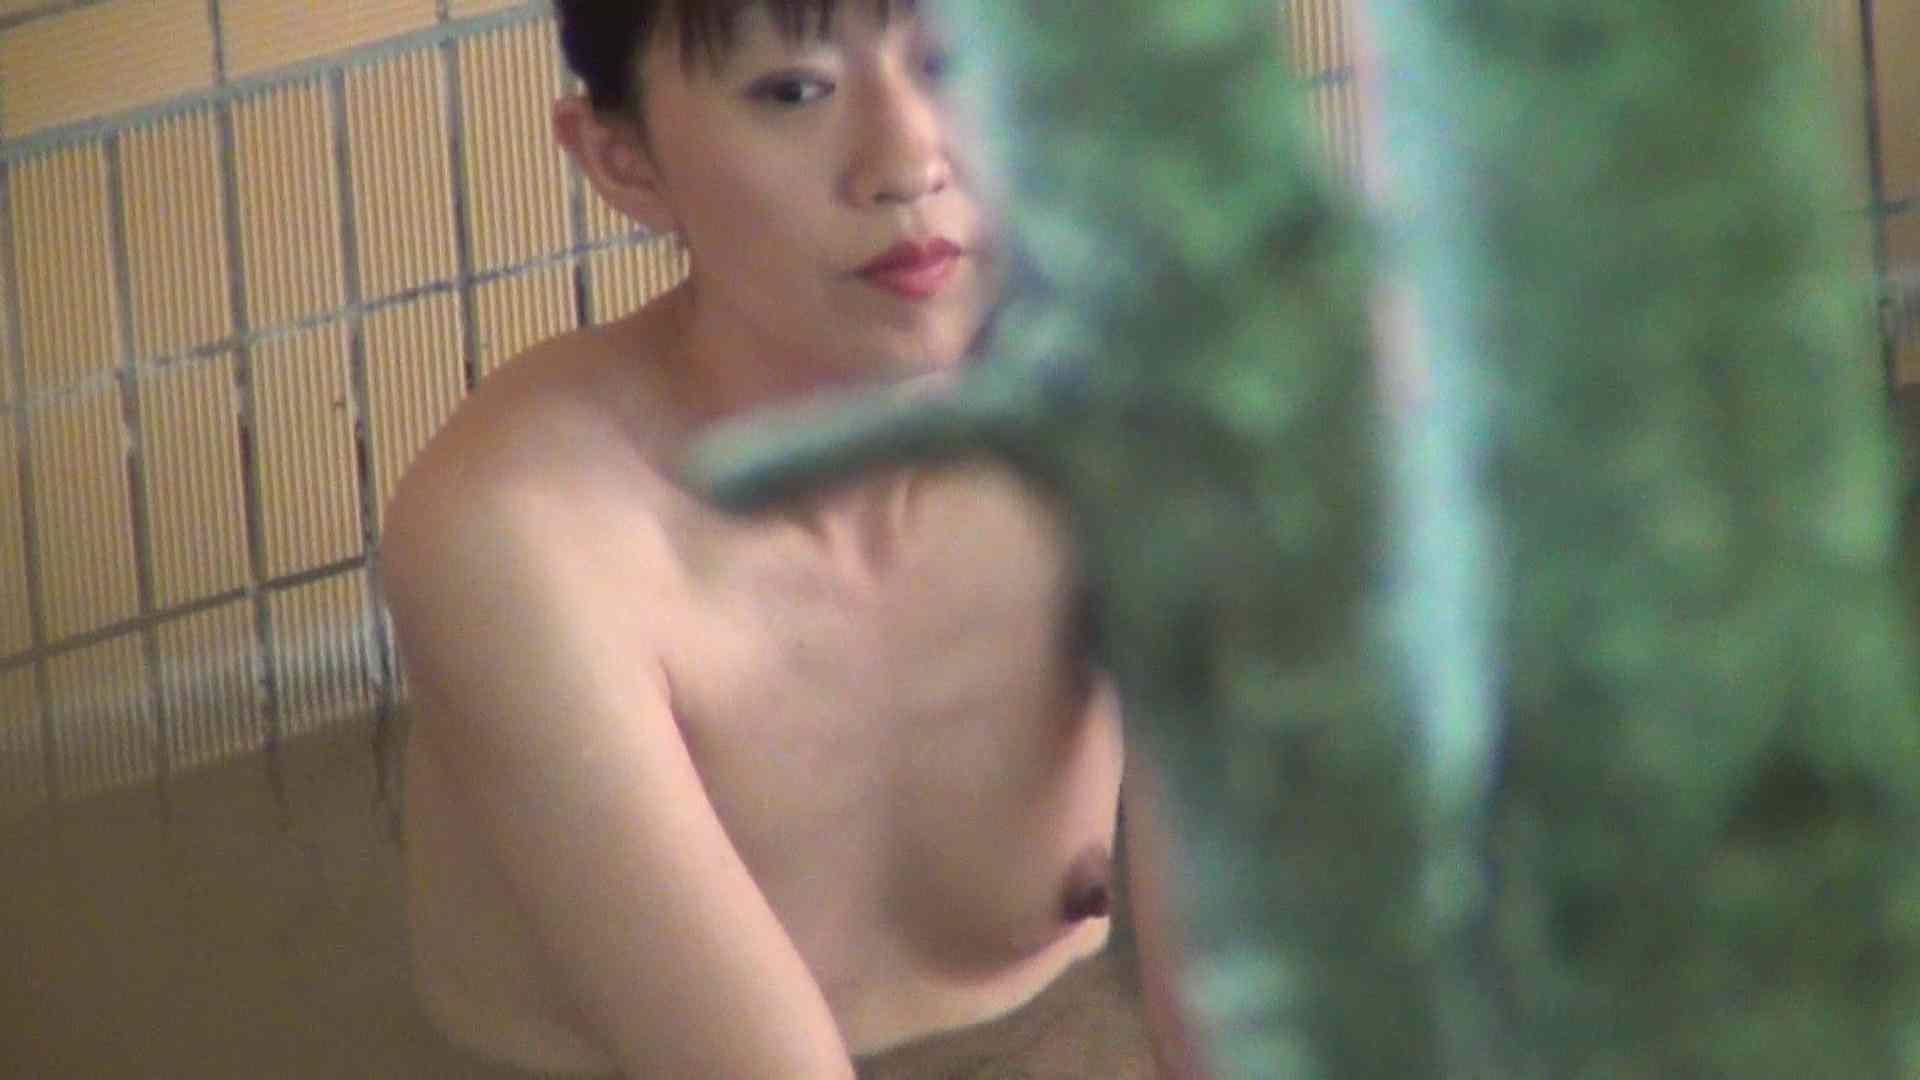 Vol.76 吸われ続けた乳首に年齢を感じますが、引き締まった身体 乳首 オメコ動画キャプチャ 94PIX 67